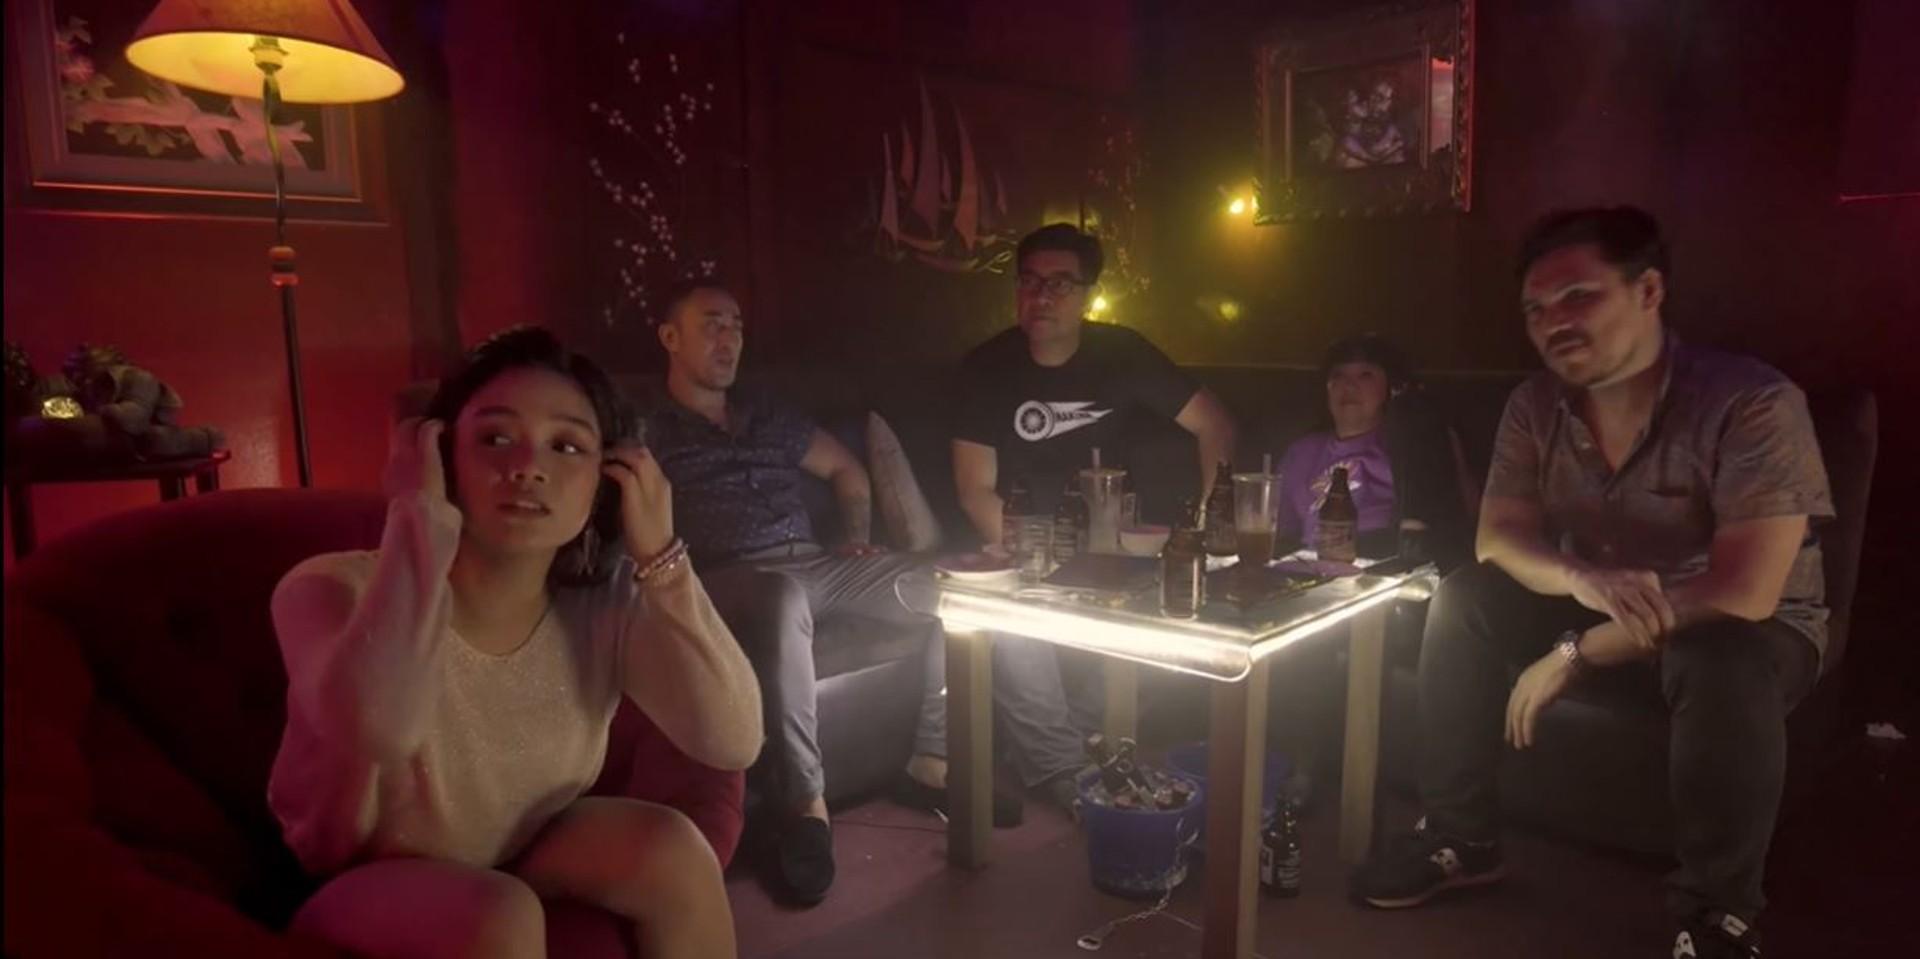 Imago release 'Partida' music video featuring BenteDos – watch